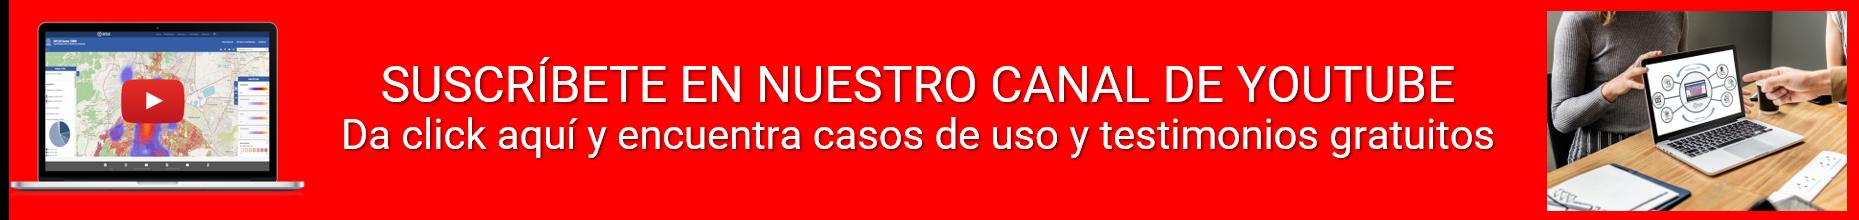 Datlas_Promo_Youtube_Suscribe